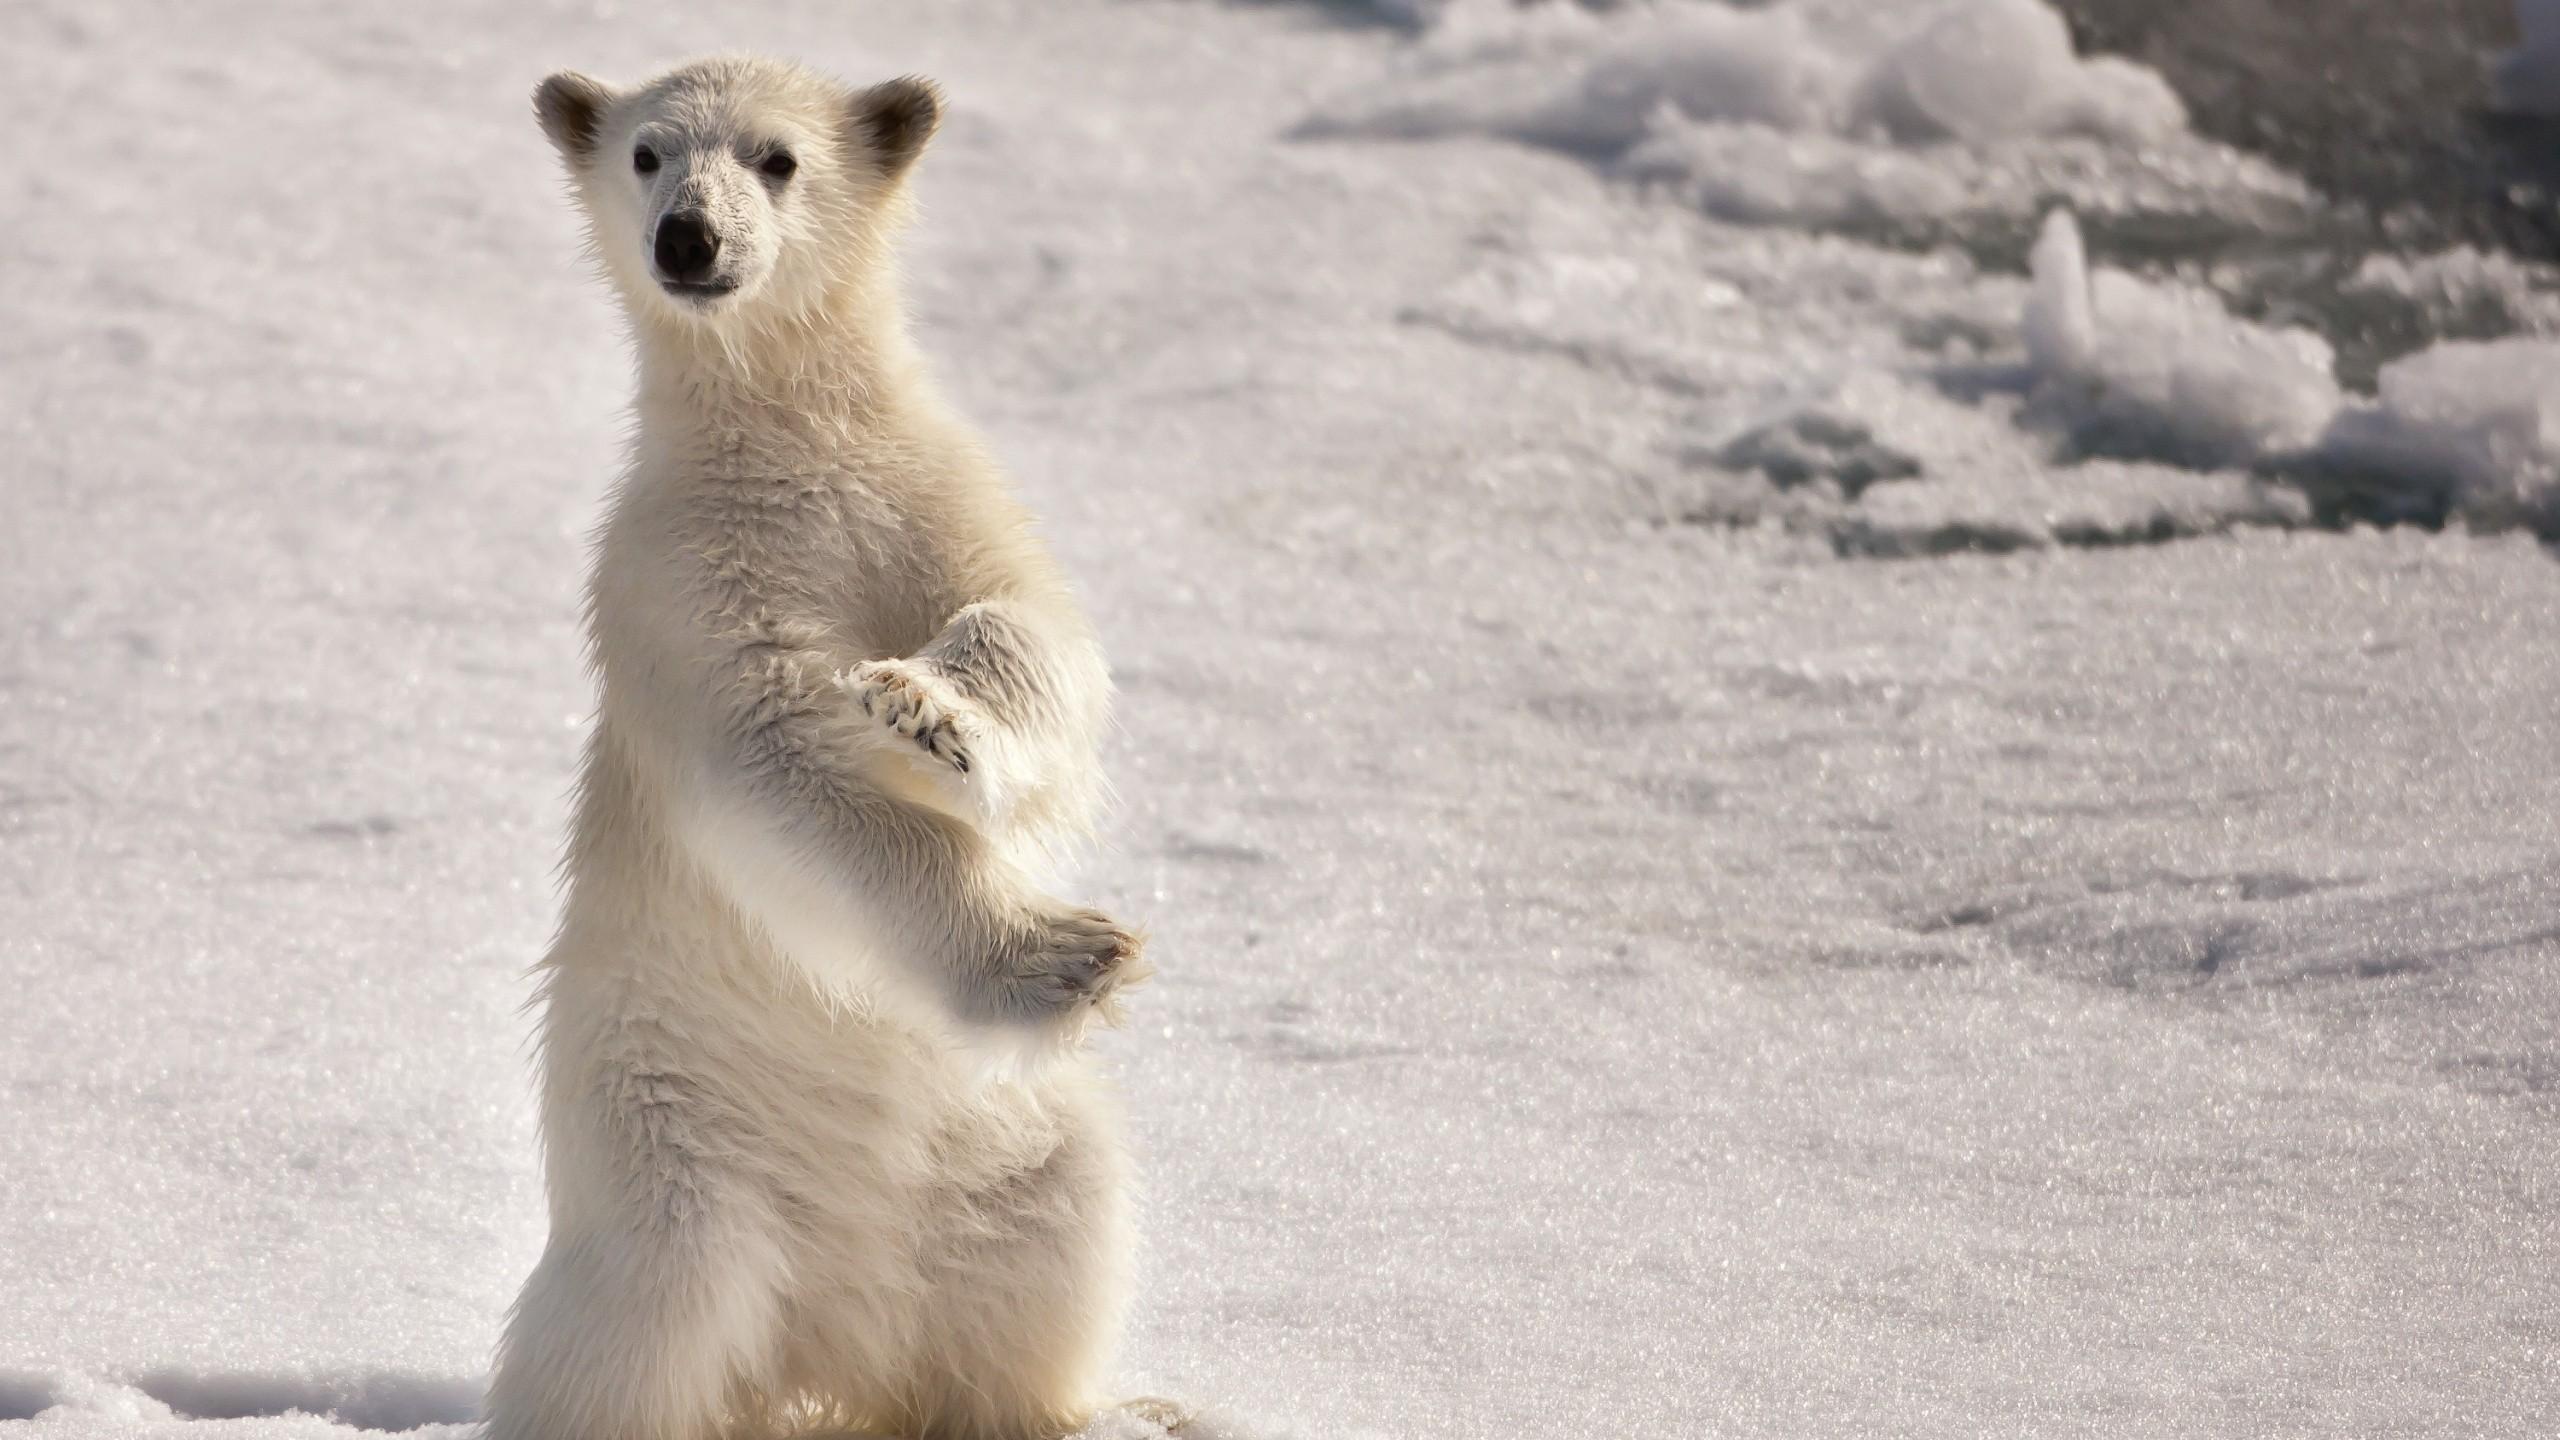 Ice snow animals polar bears baby animals wallpaper | 2560x1440 ...